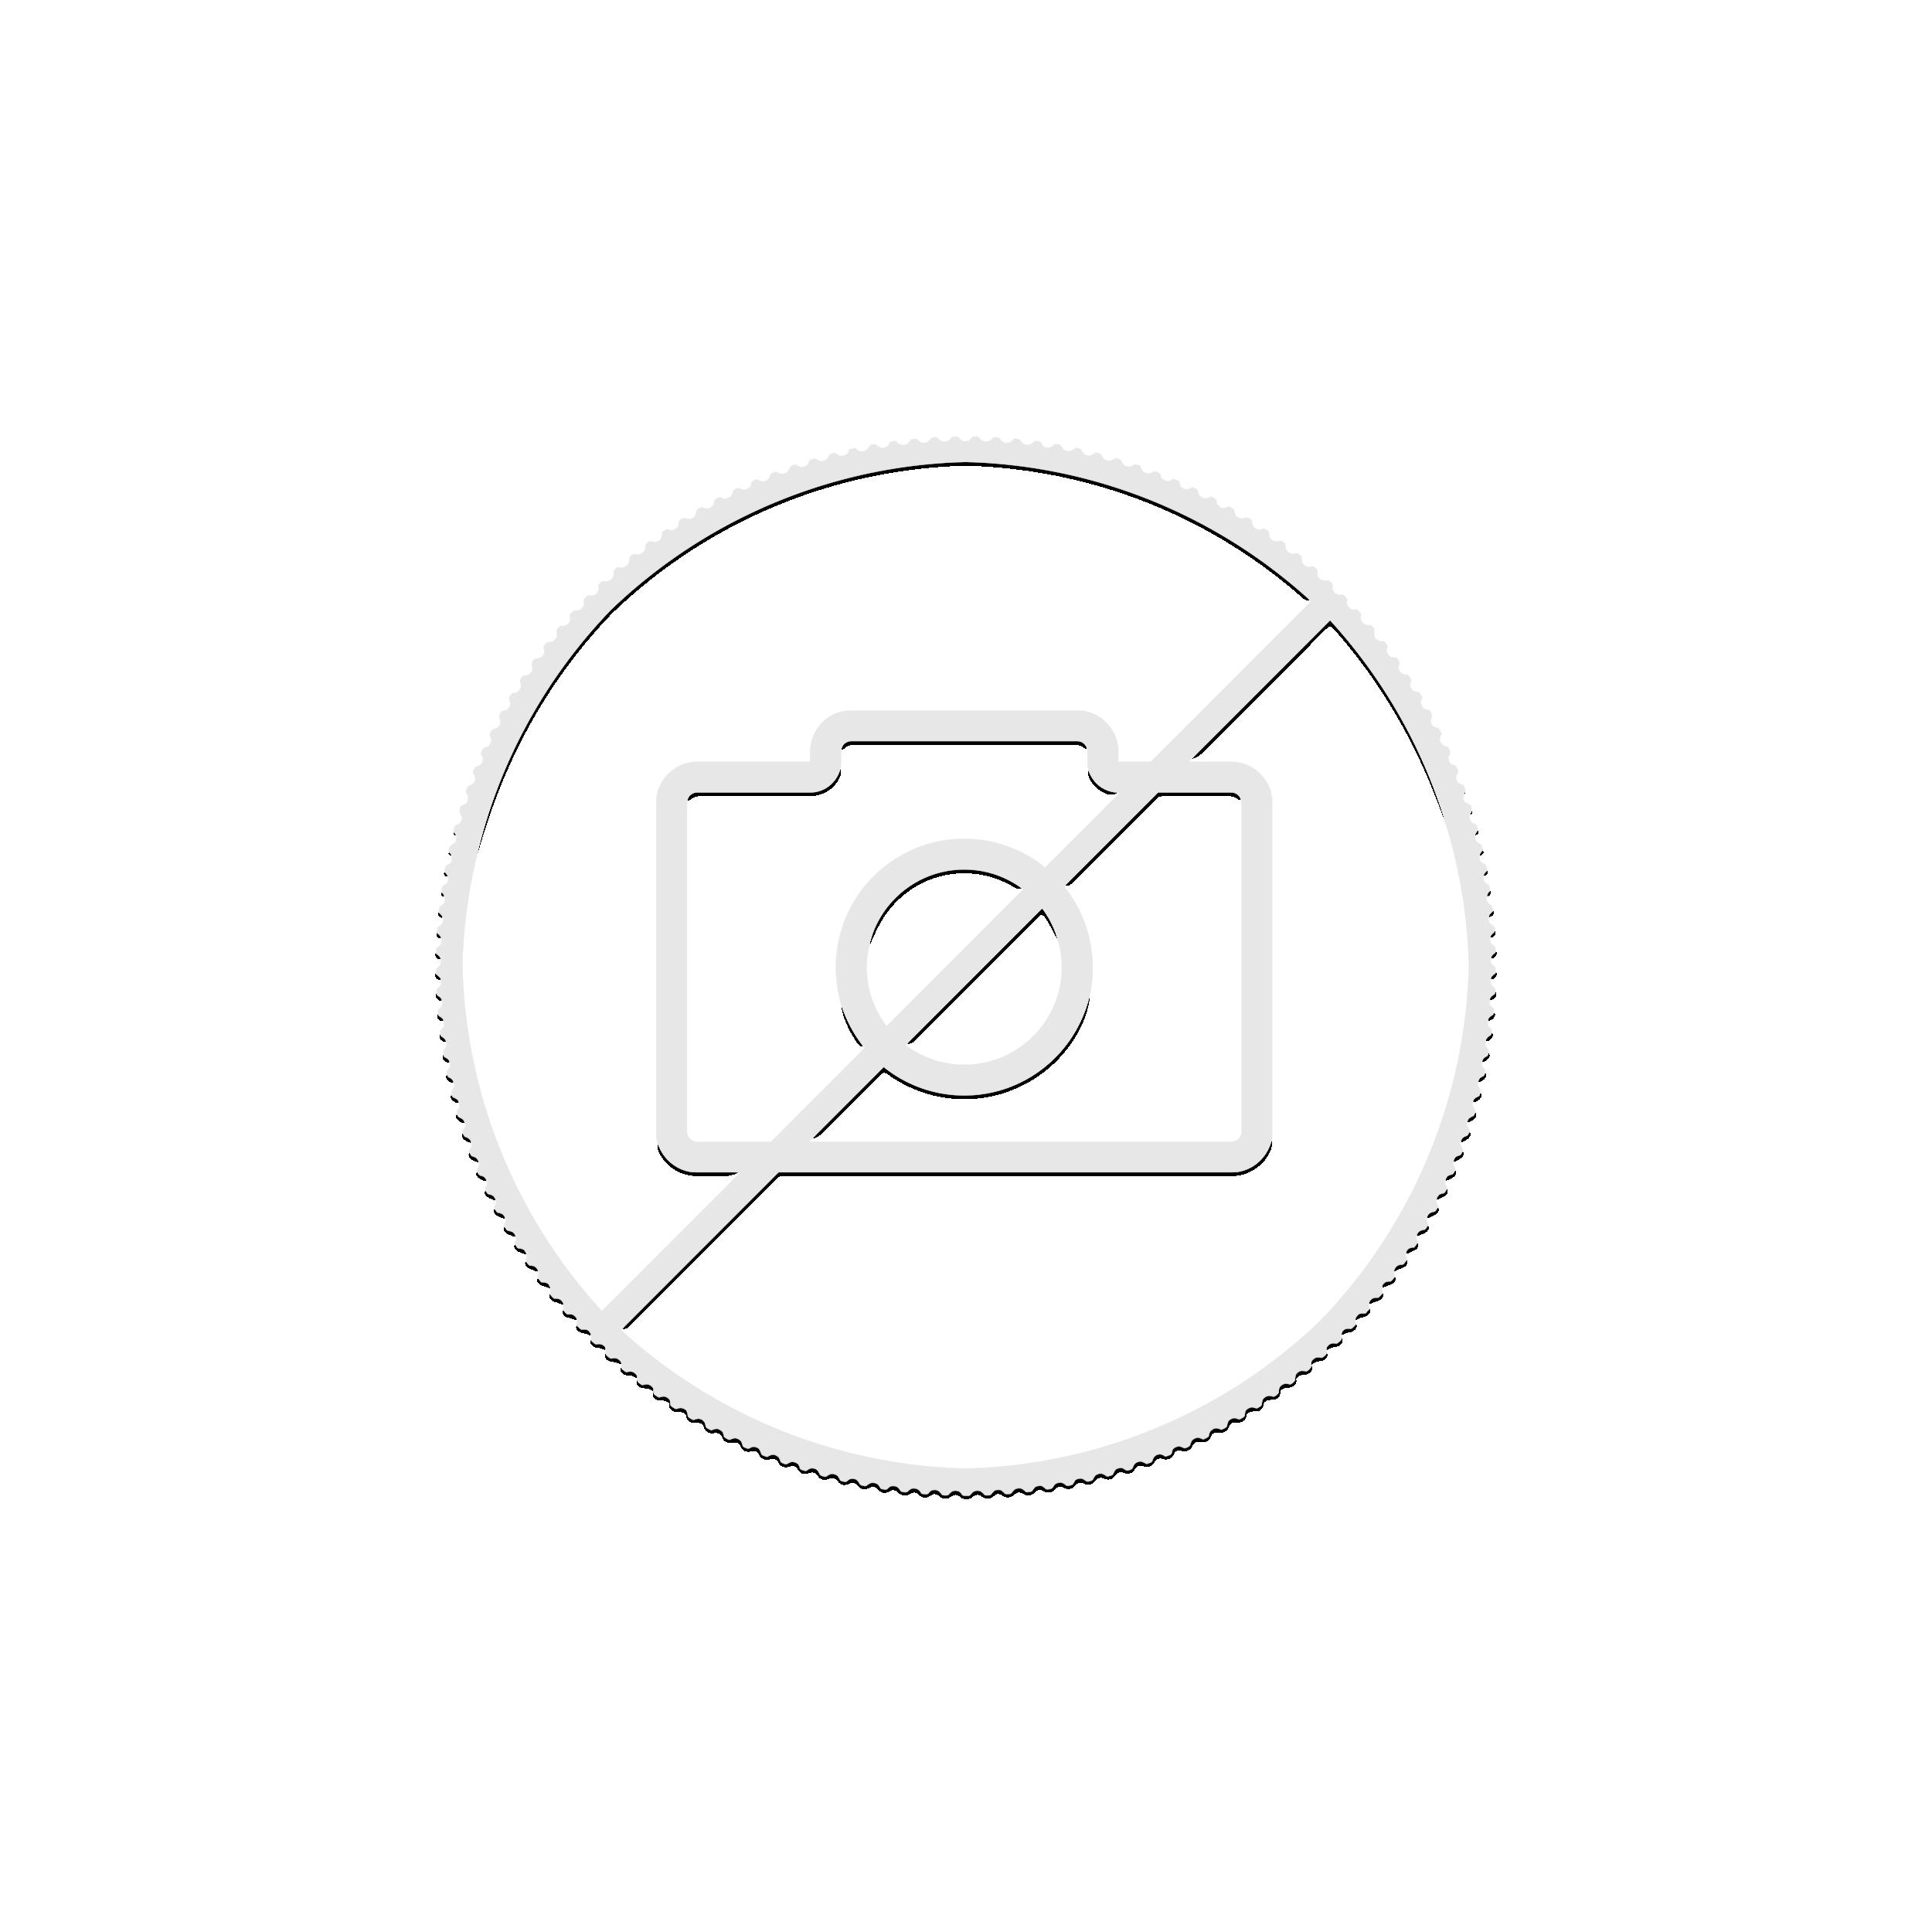 5-Delige set gouden munten Panda 2018